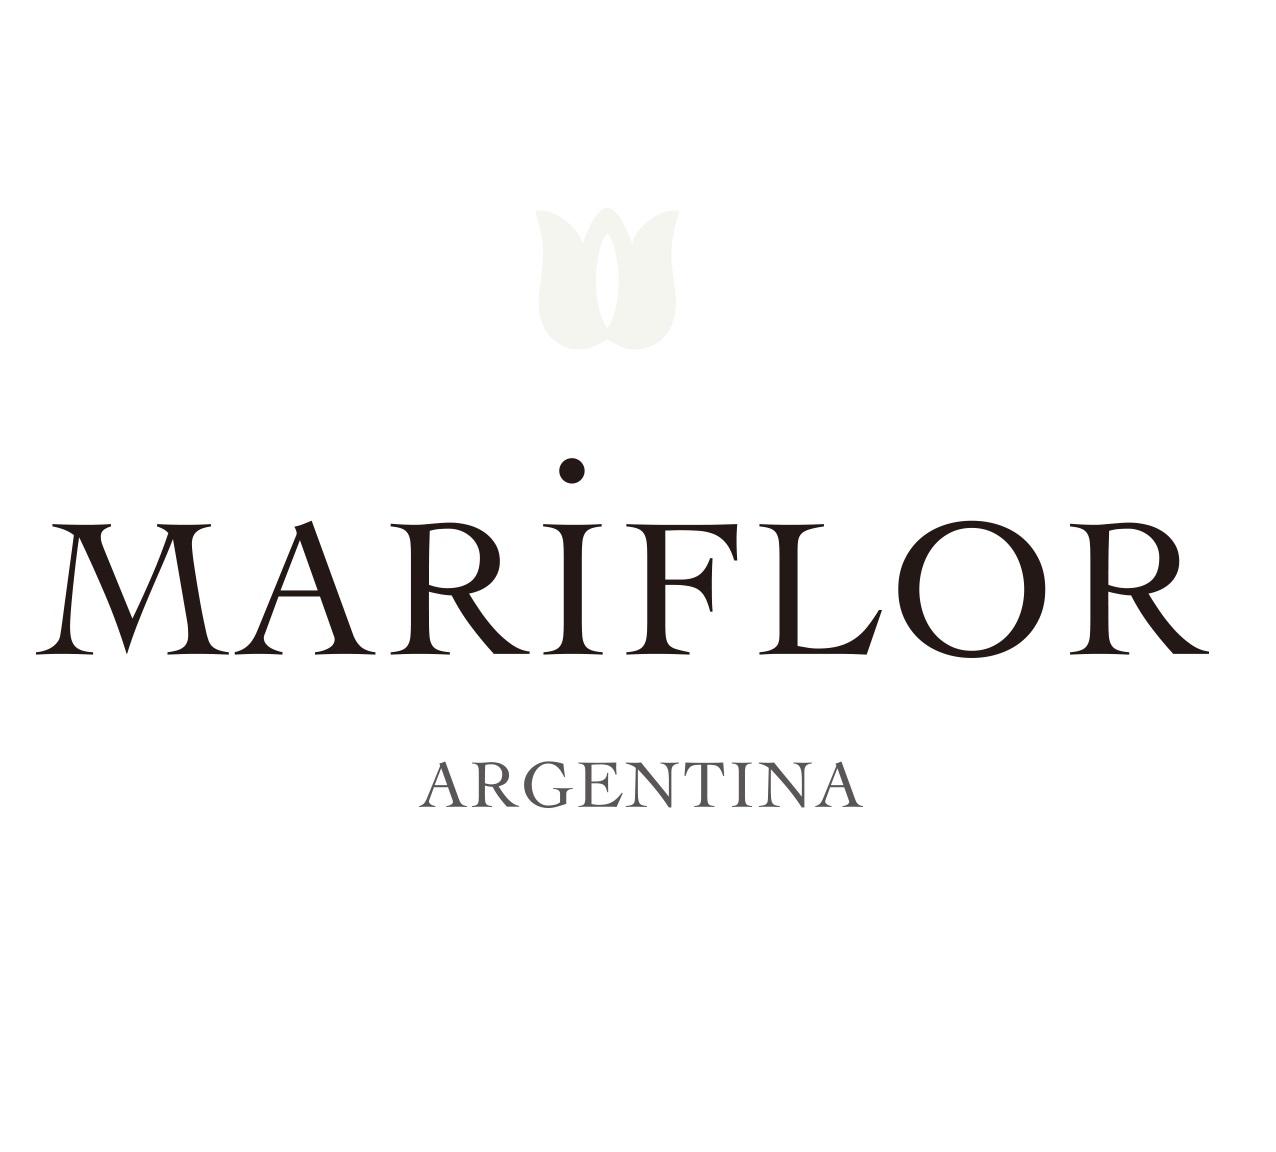 Mariflor